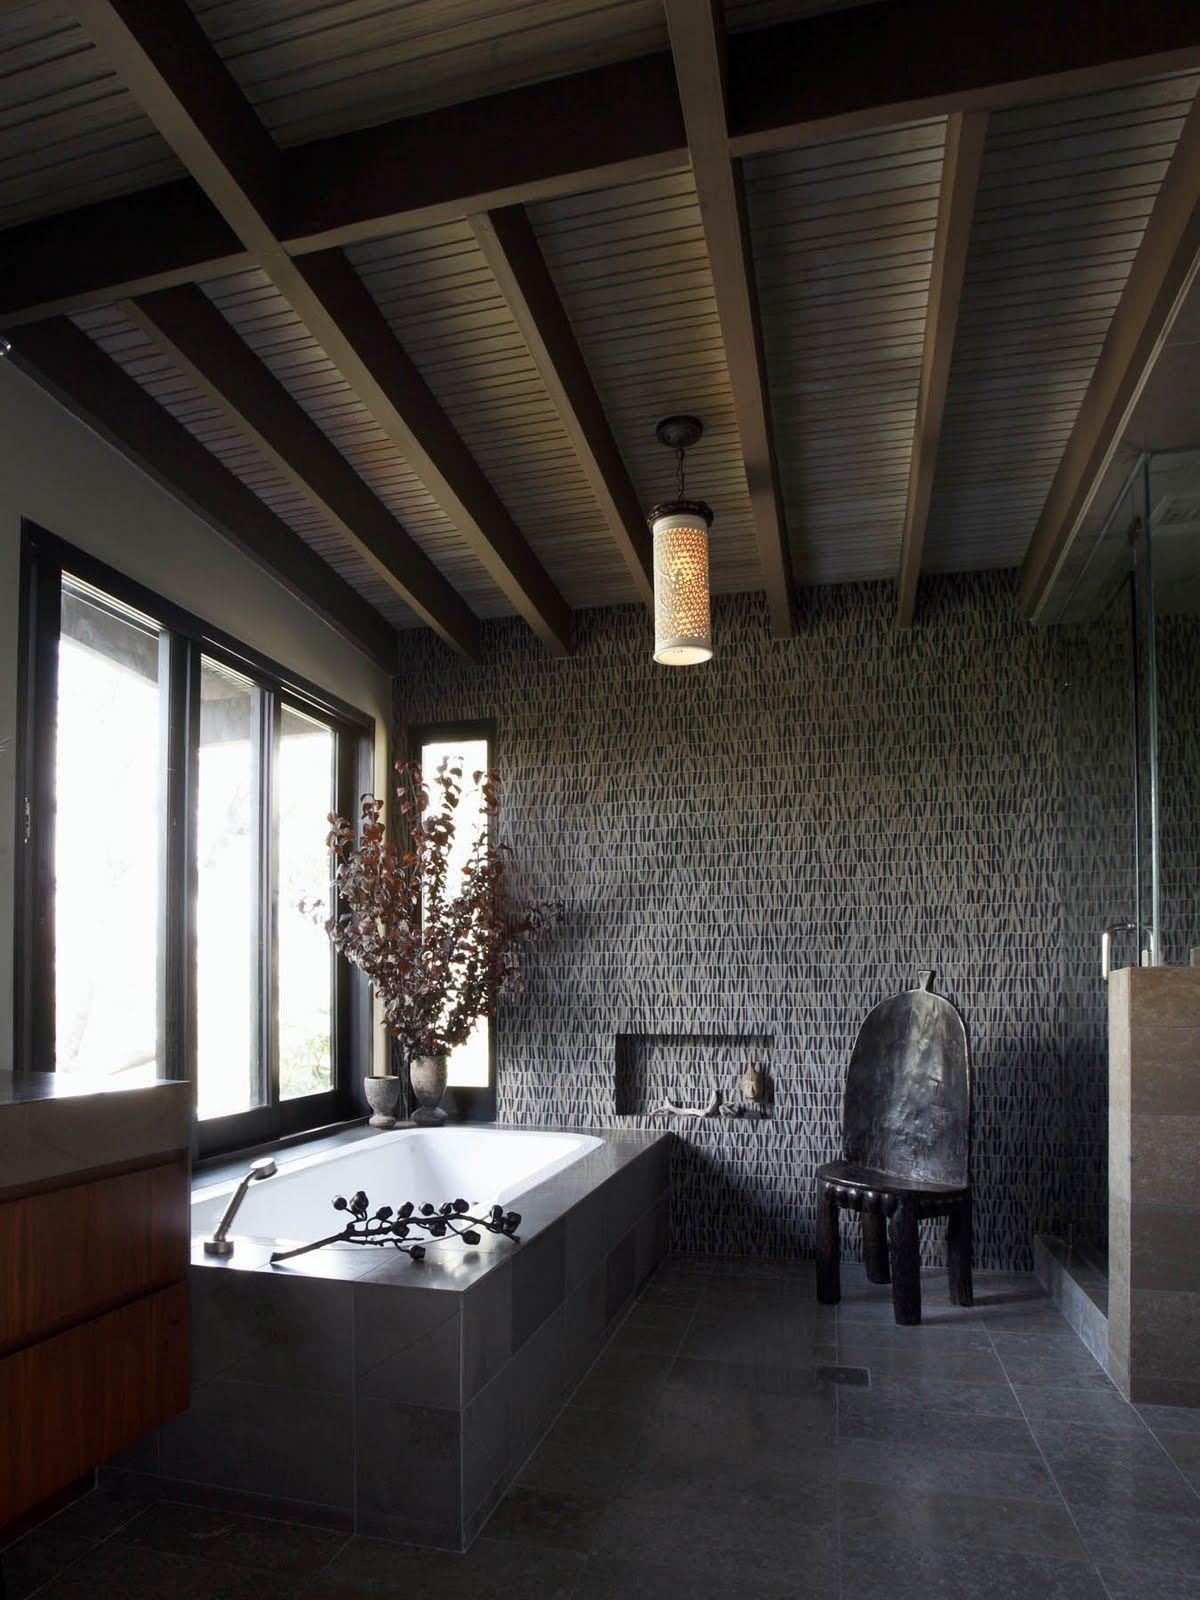 Moody Zen Bath By Edward Duarte House Badezimmer Baden